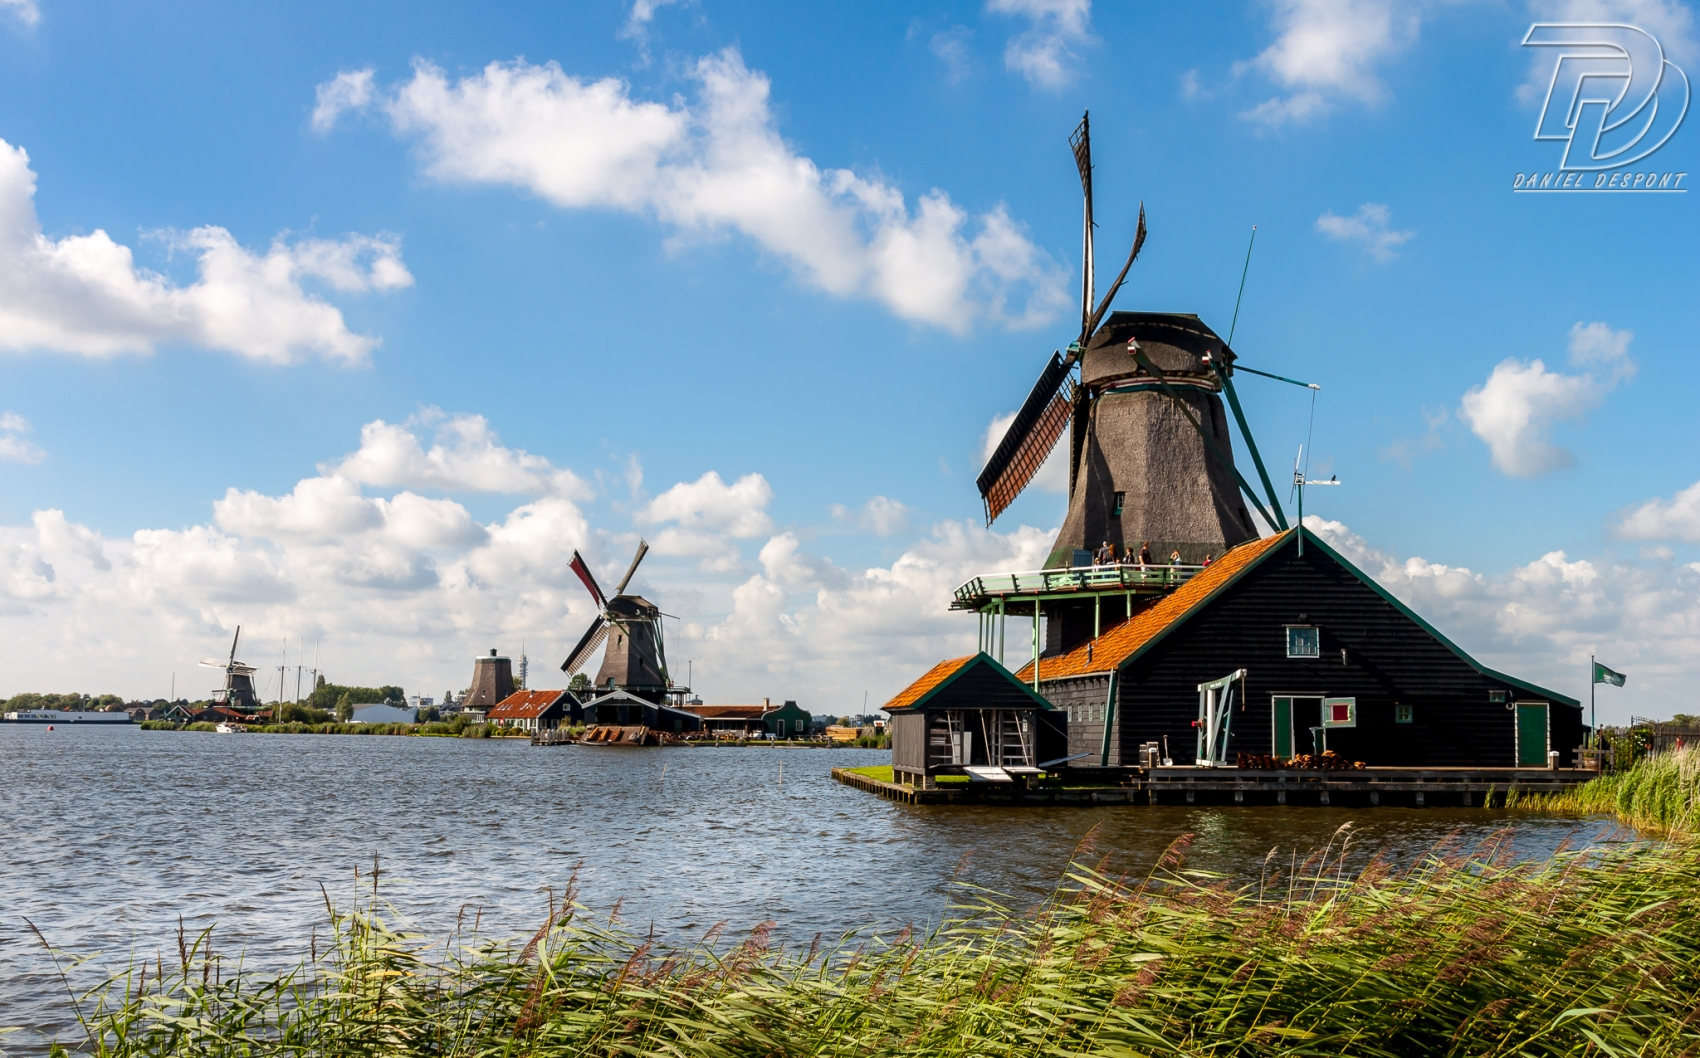 Vollendam, NL